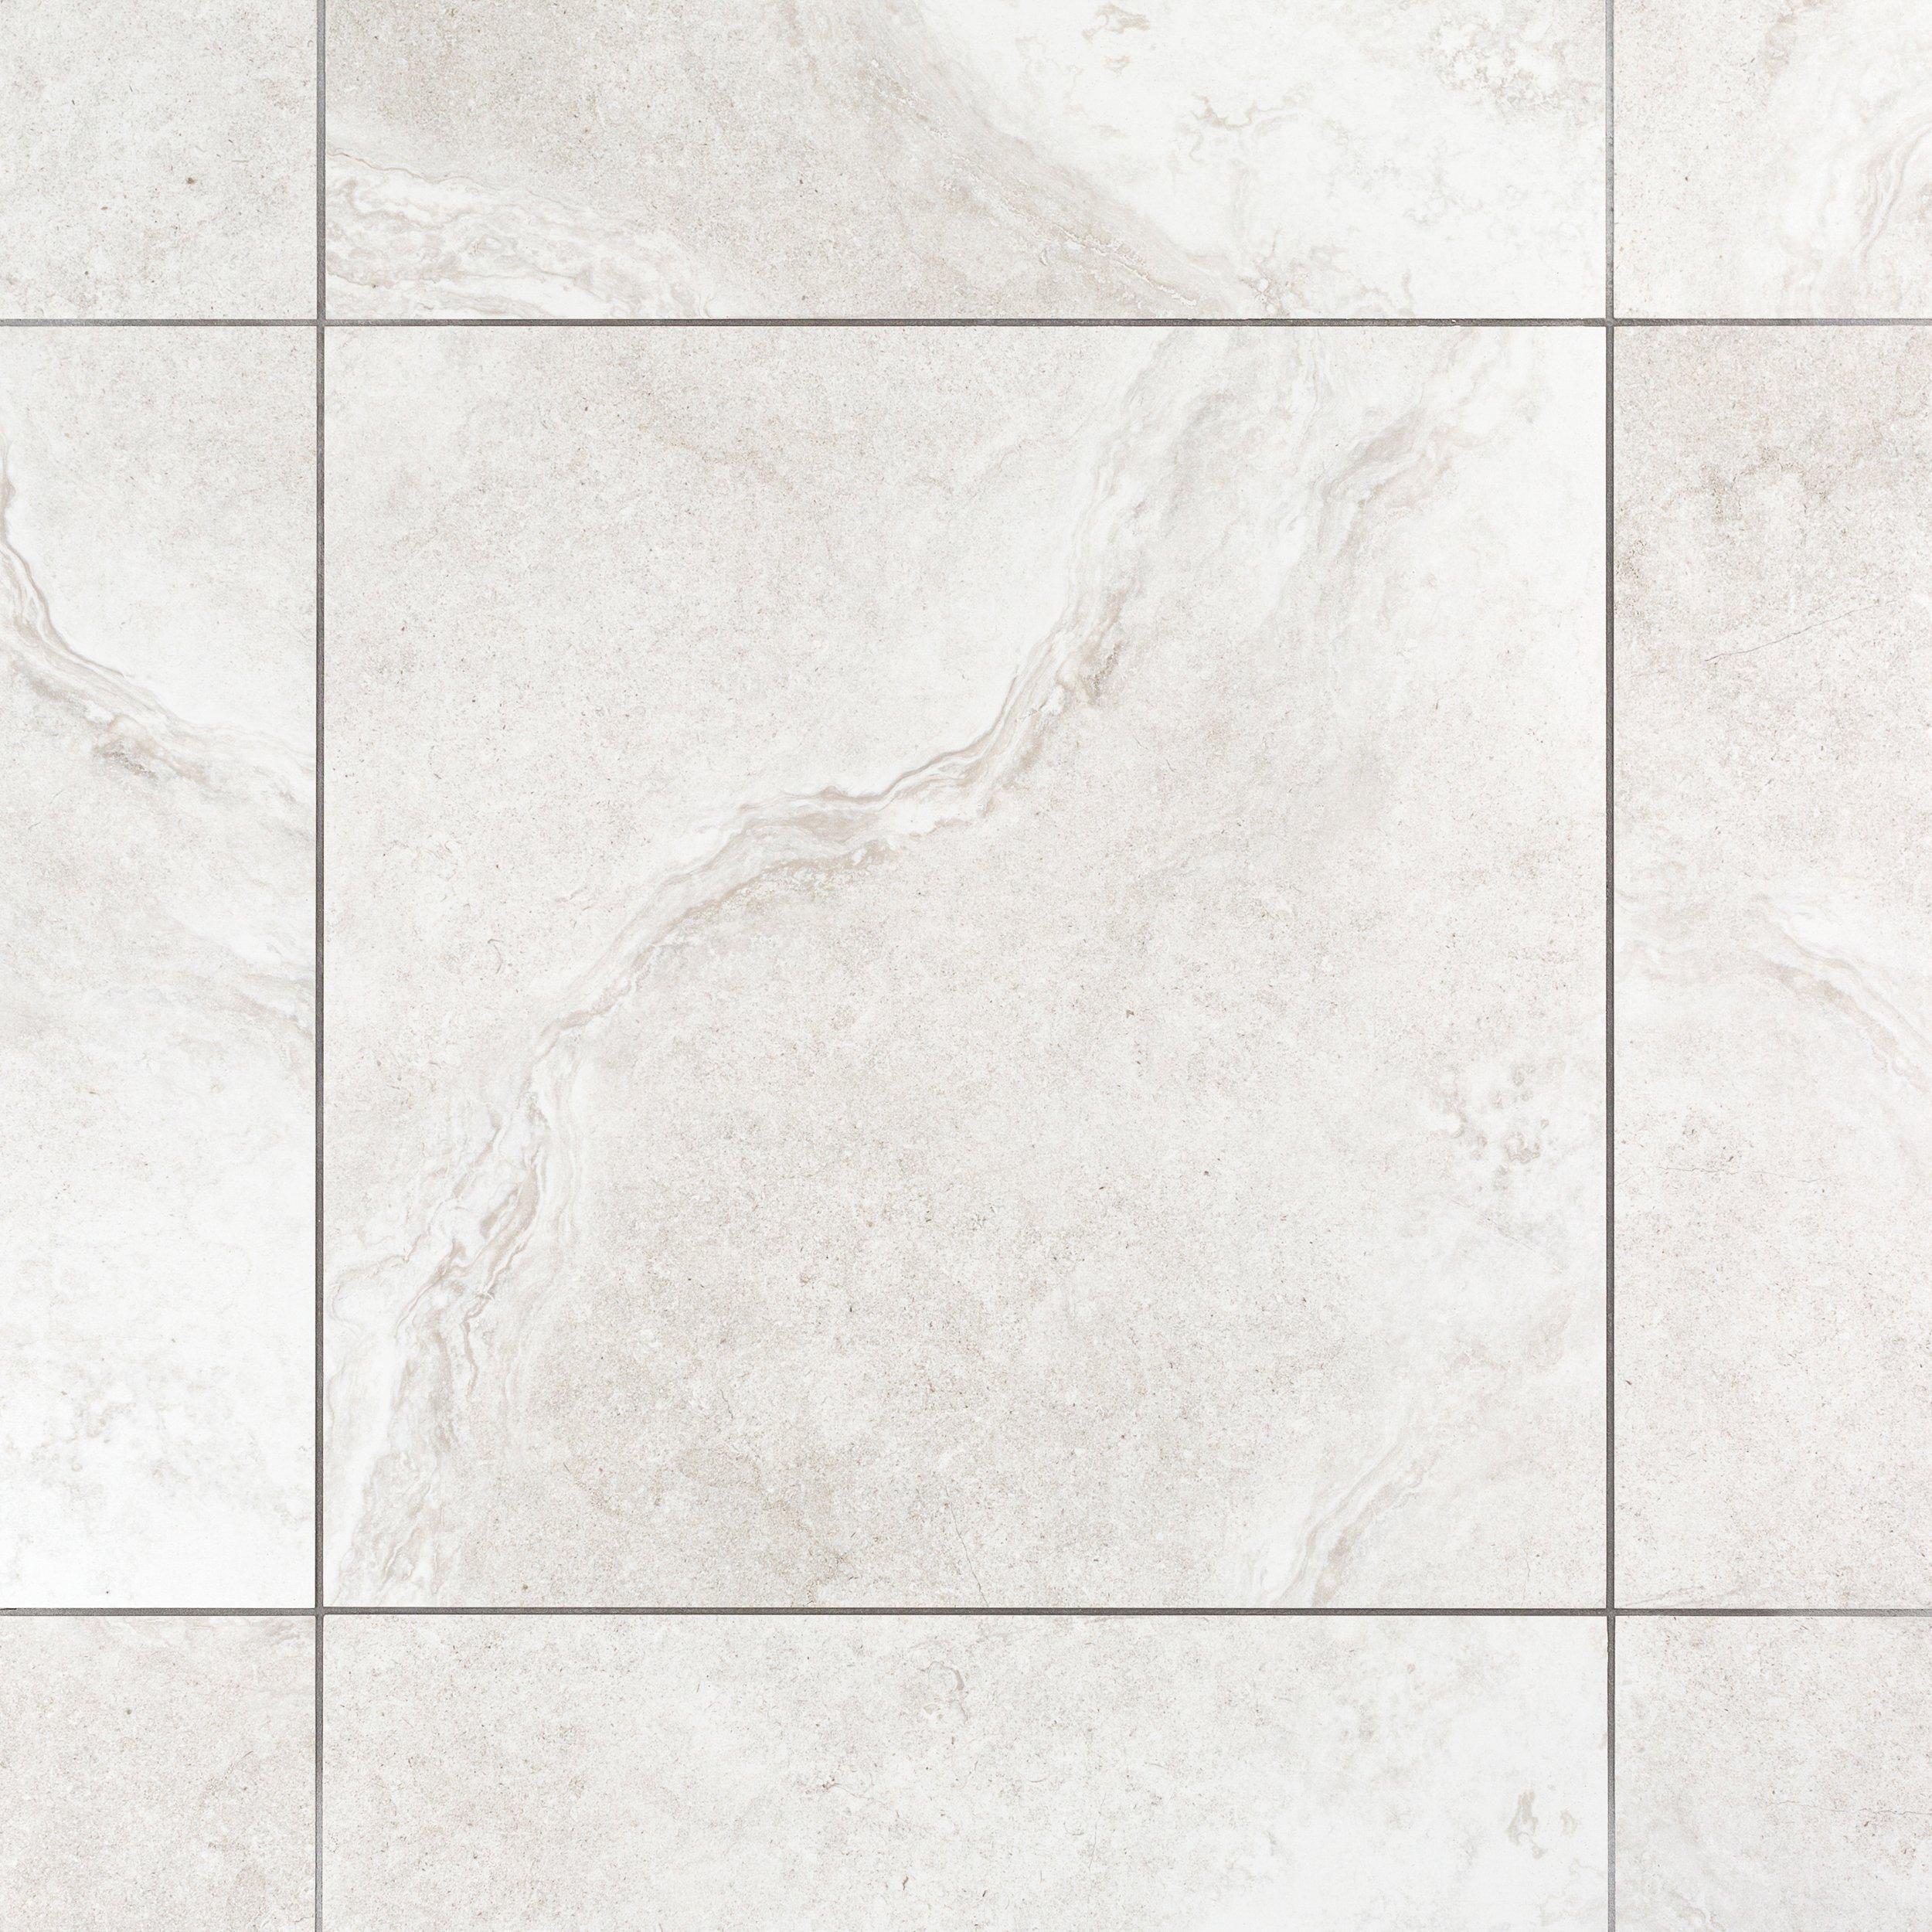 Kodiak White Polished Porcelain Tile Products In 2019